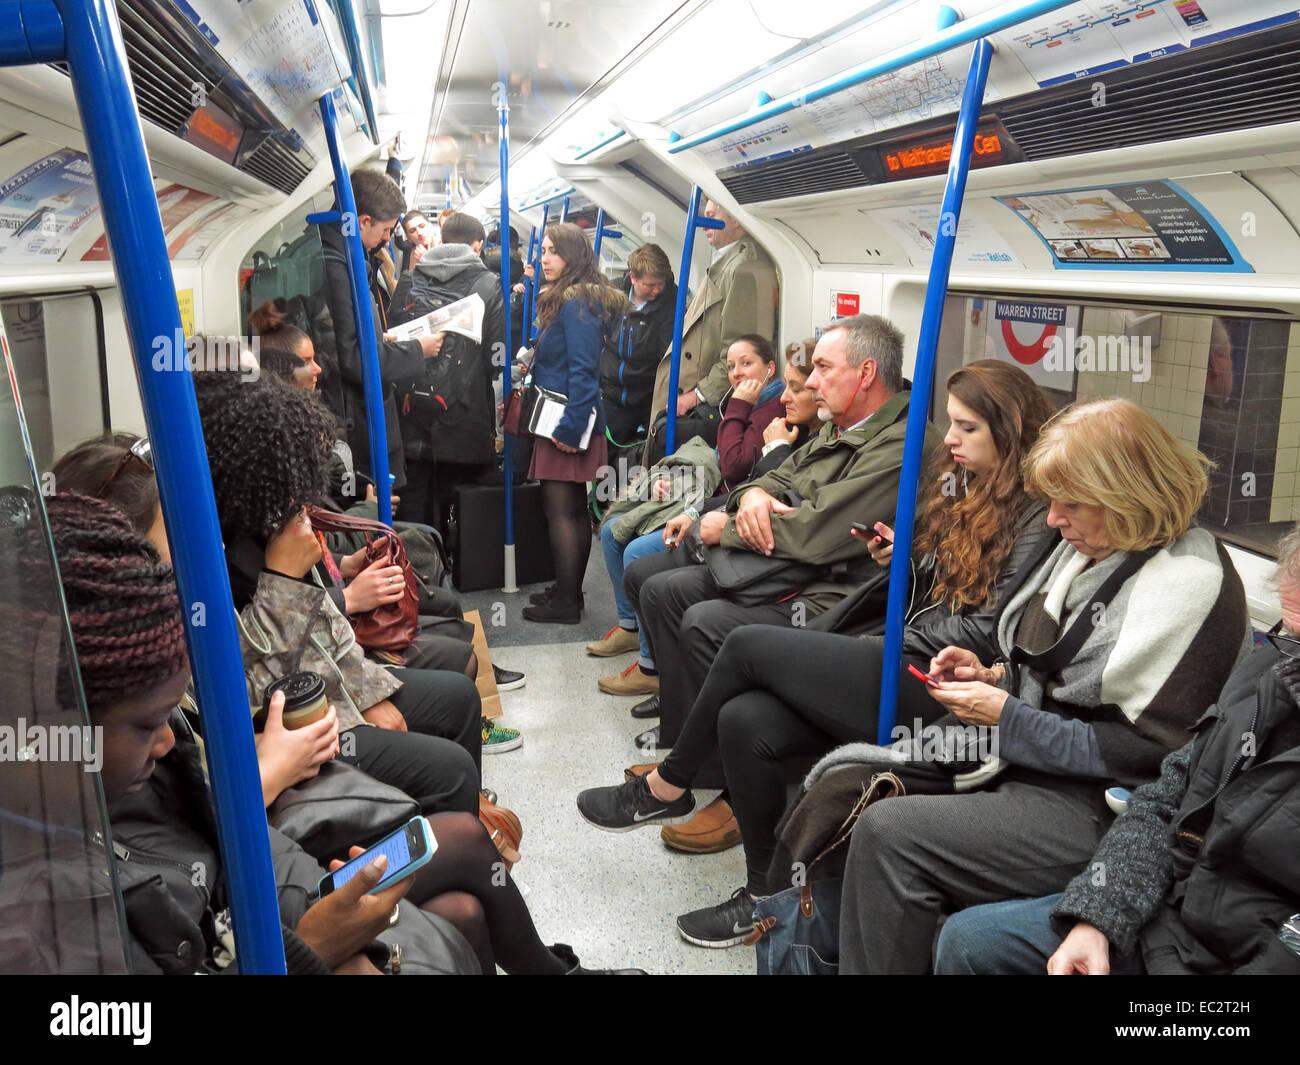 Busy Victoria Tube line train in London Underground Stock Photo